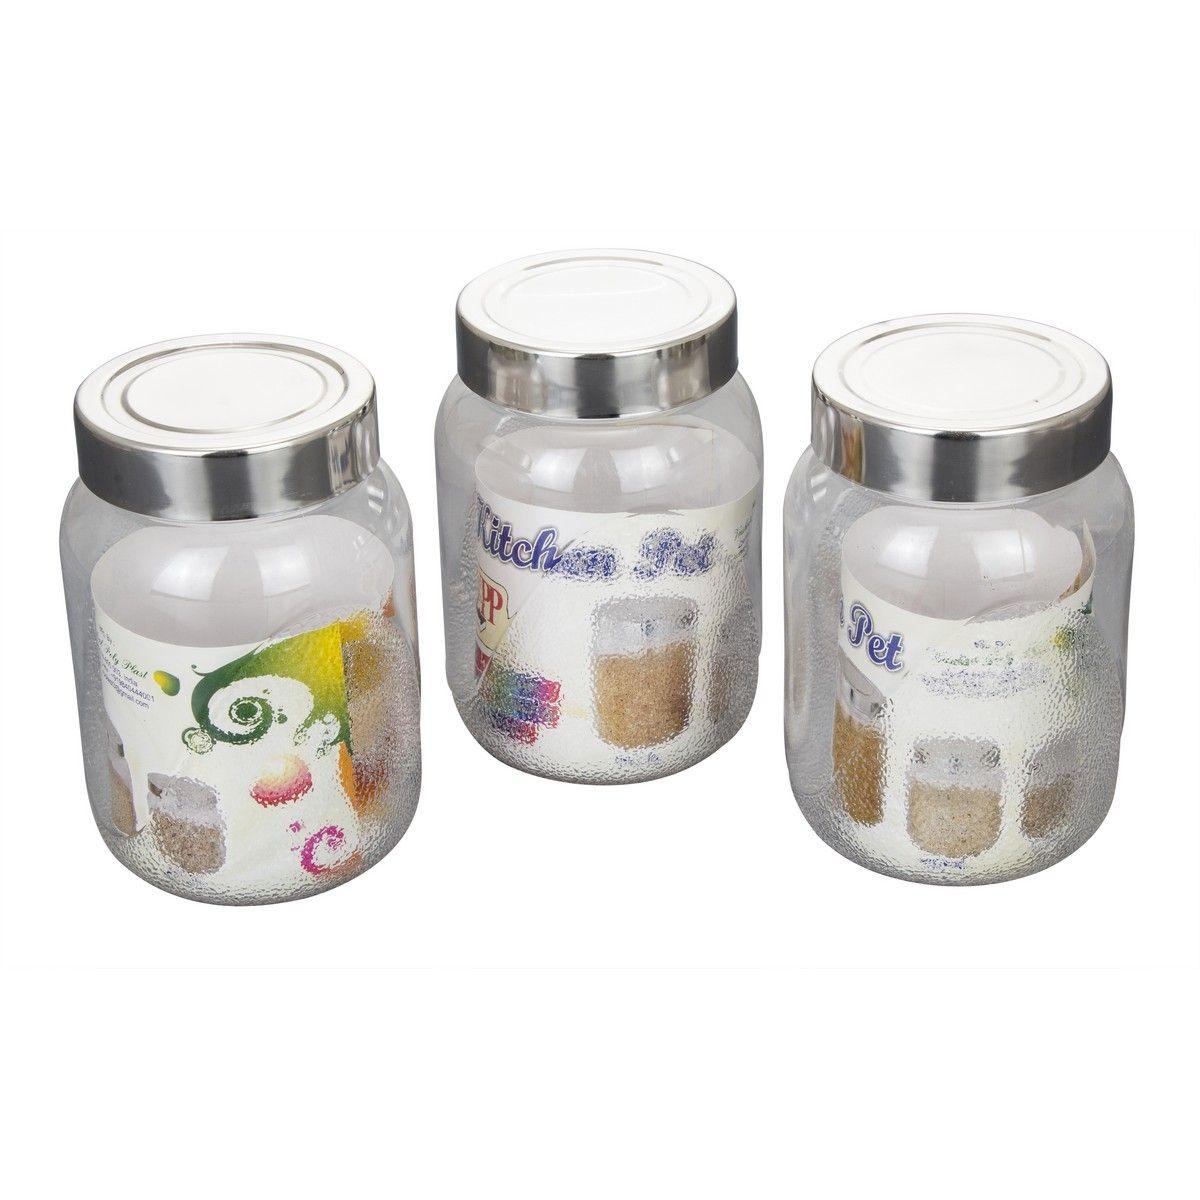 Buy klassic vimal kitchens pet 500 ml set of 3pcs kv070 for Kitchen set naaptol